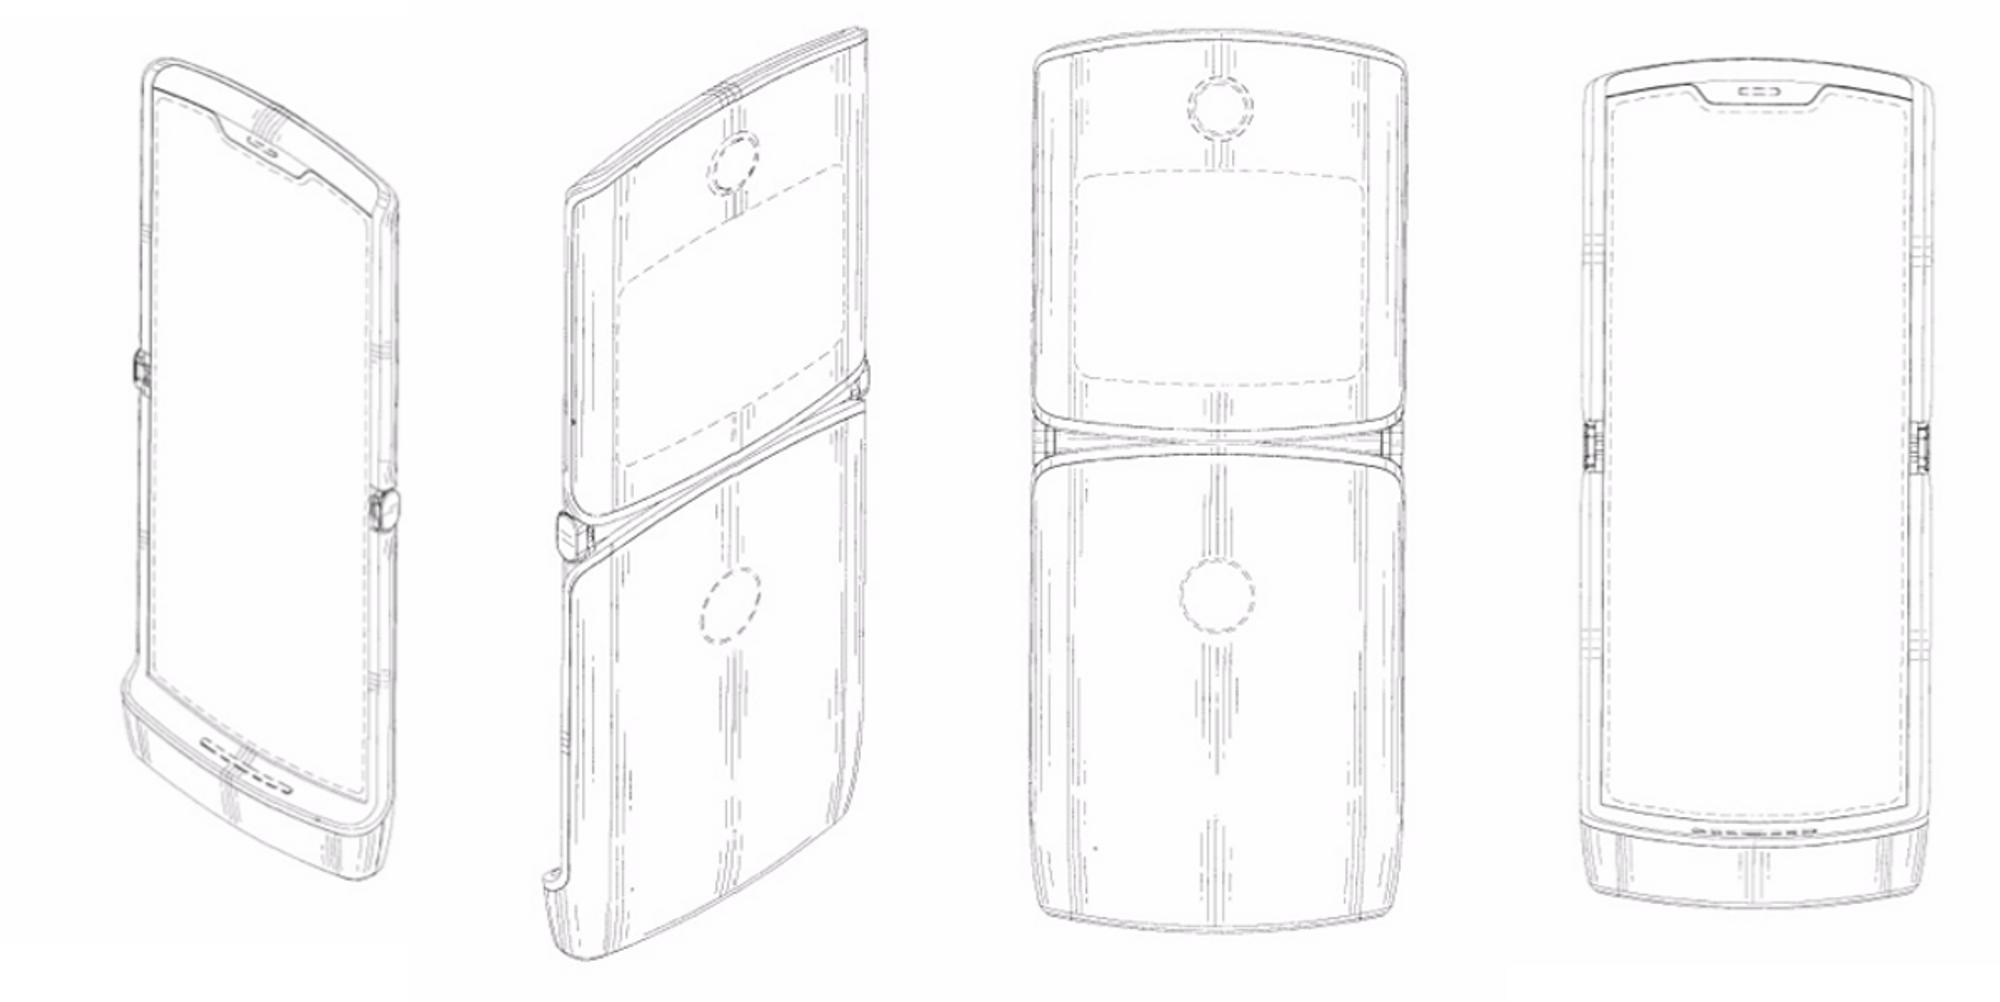 Motorola RAZR reborn: Folding phone spotted in IP filing